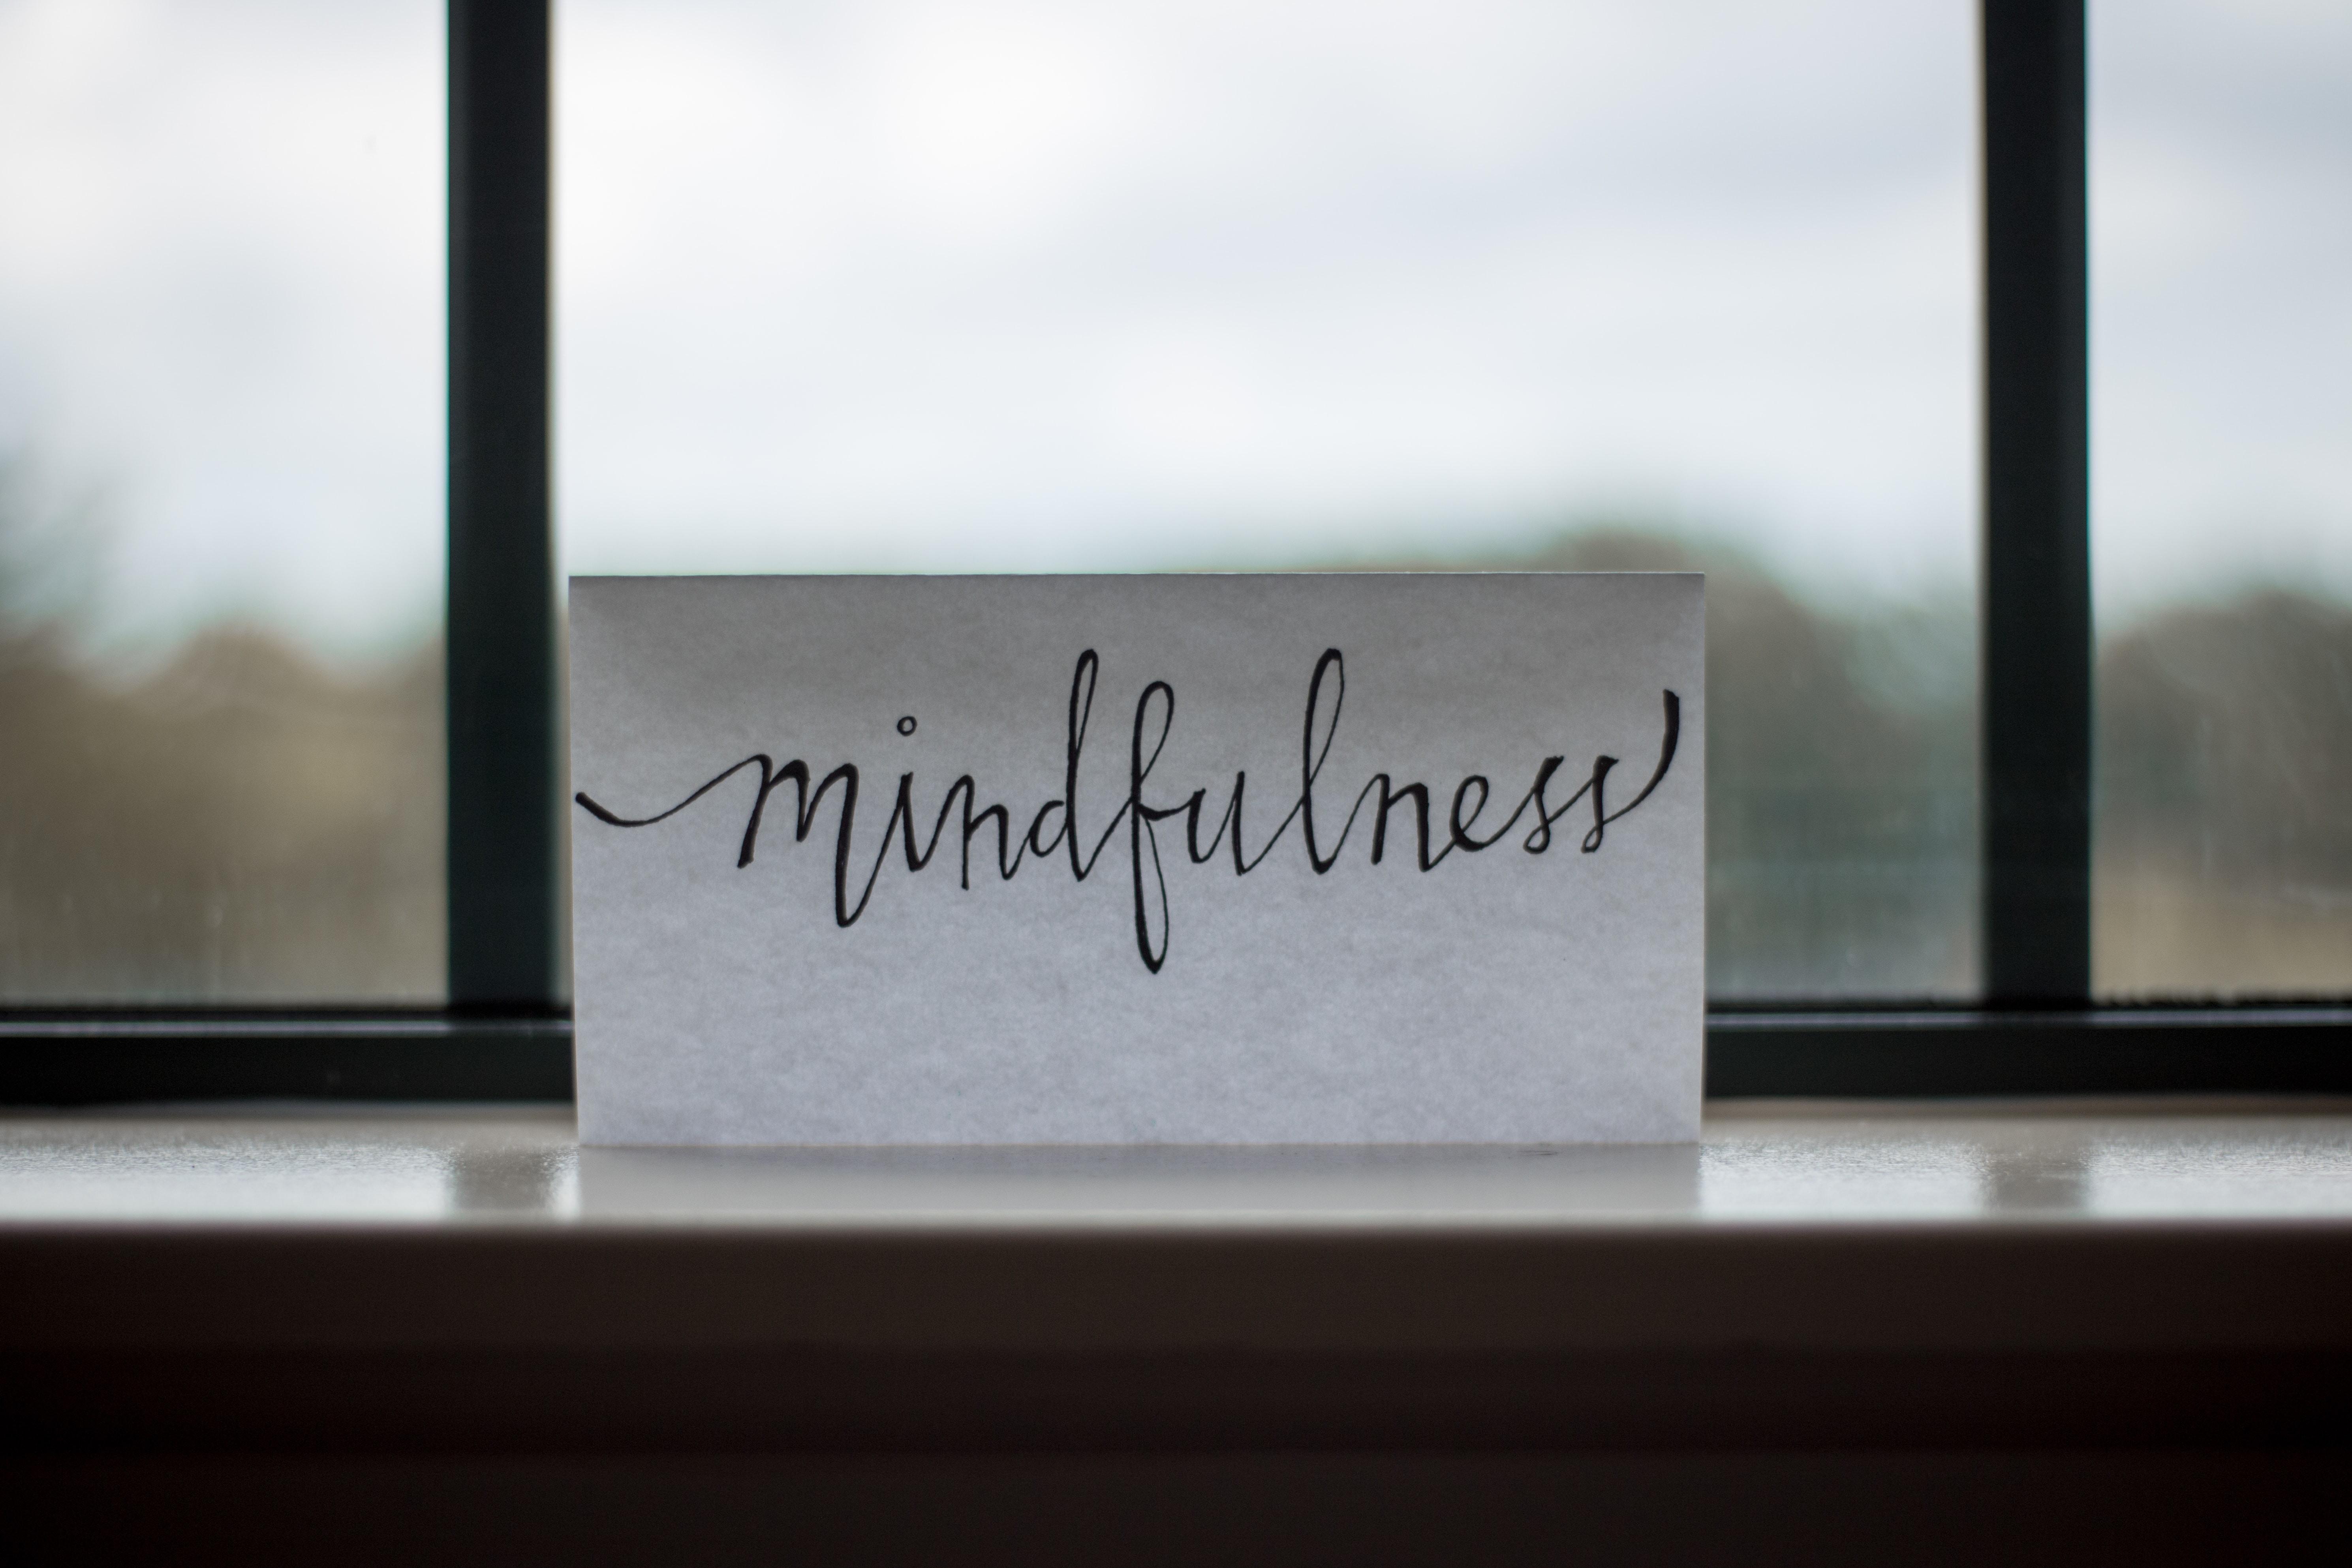 Séance de Mindfulness/Méditation